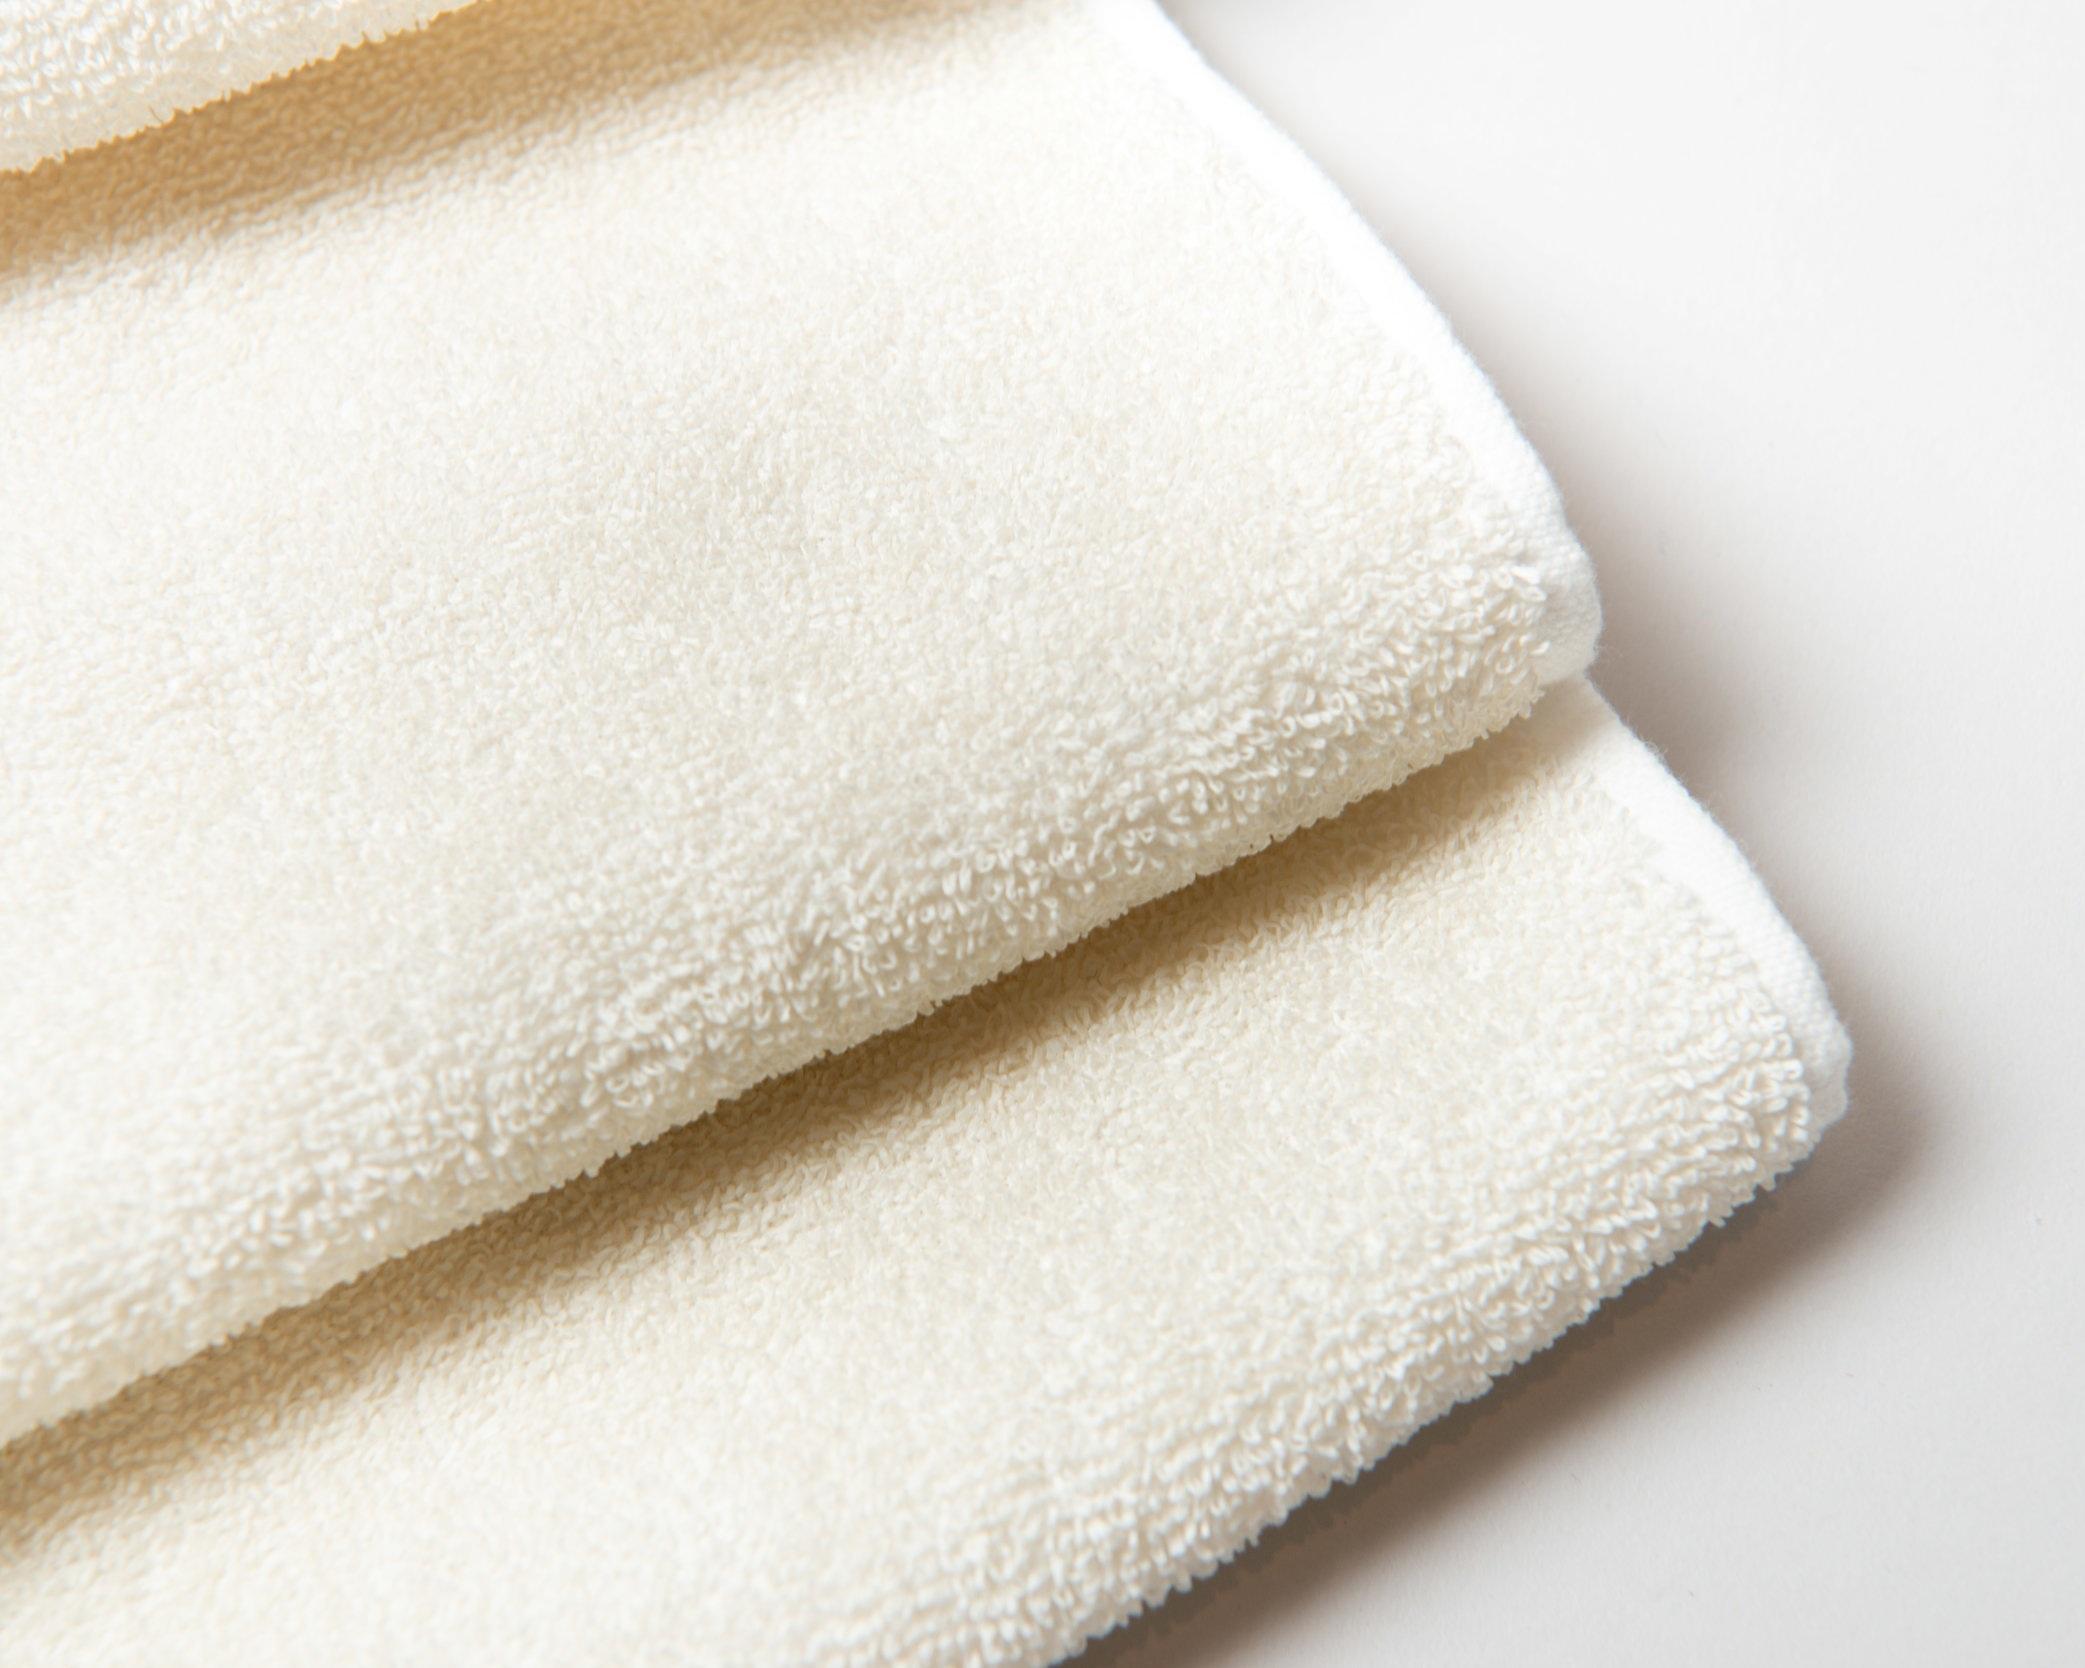 Native%26Co-Bath-Scrub-Towel-4+%281%29.jpg